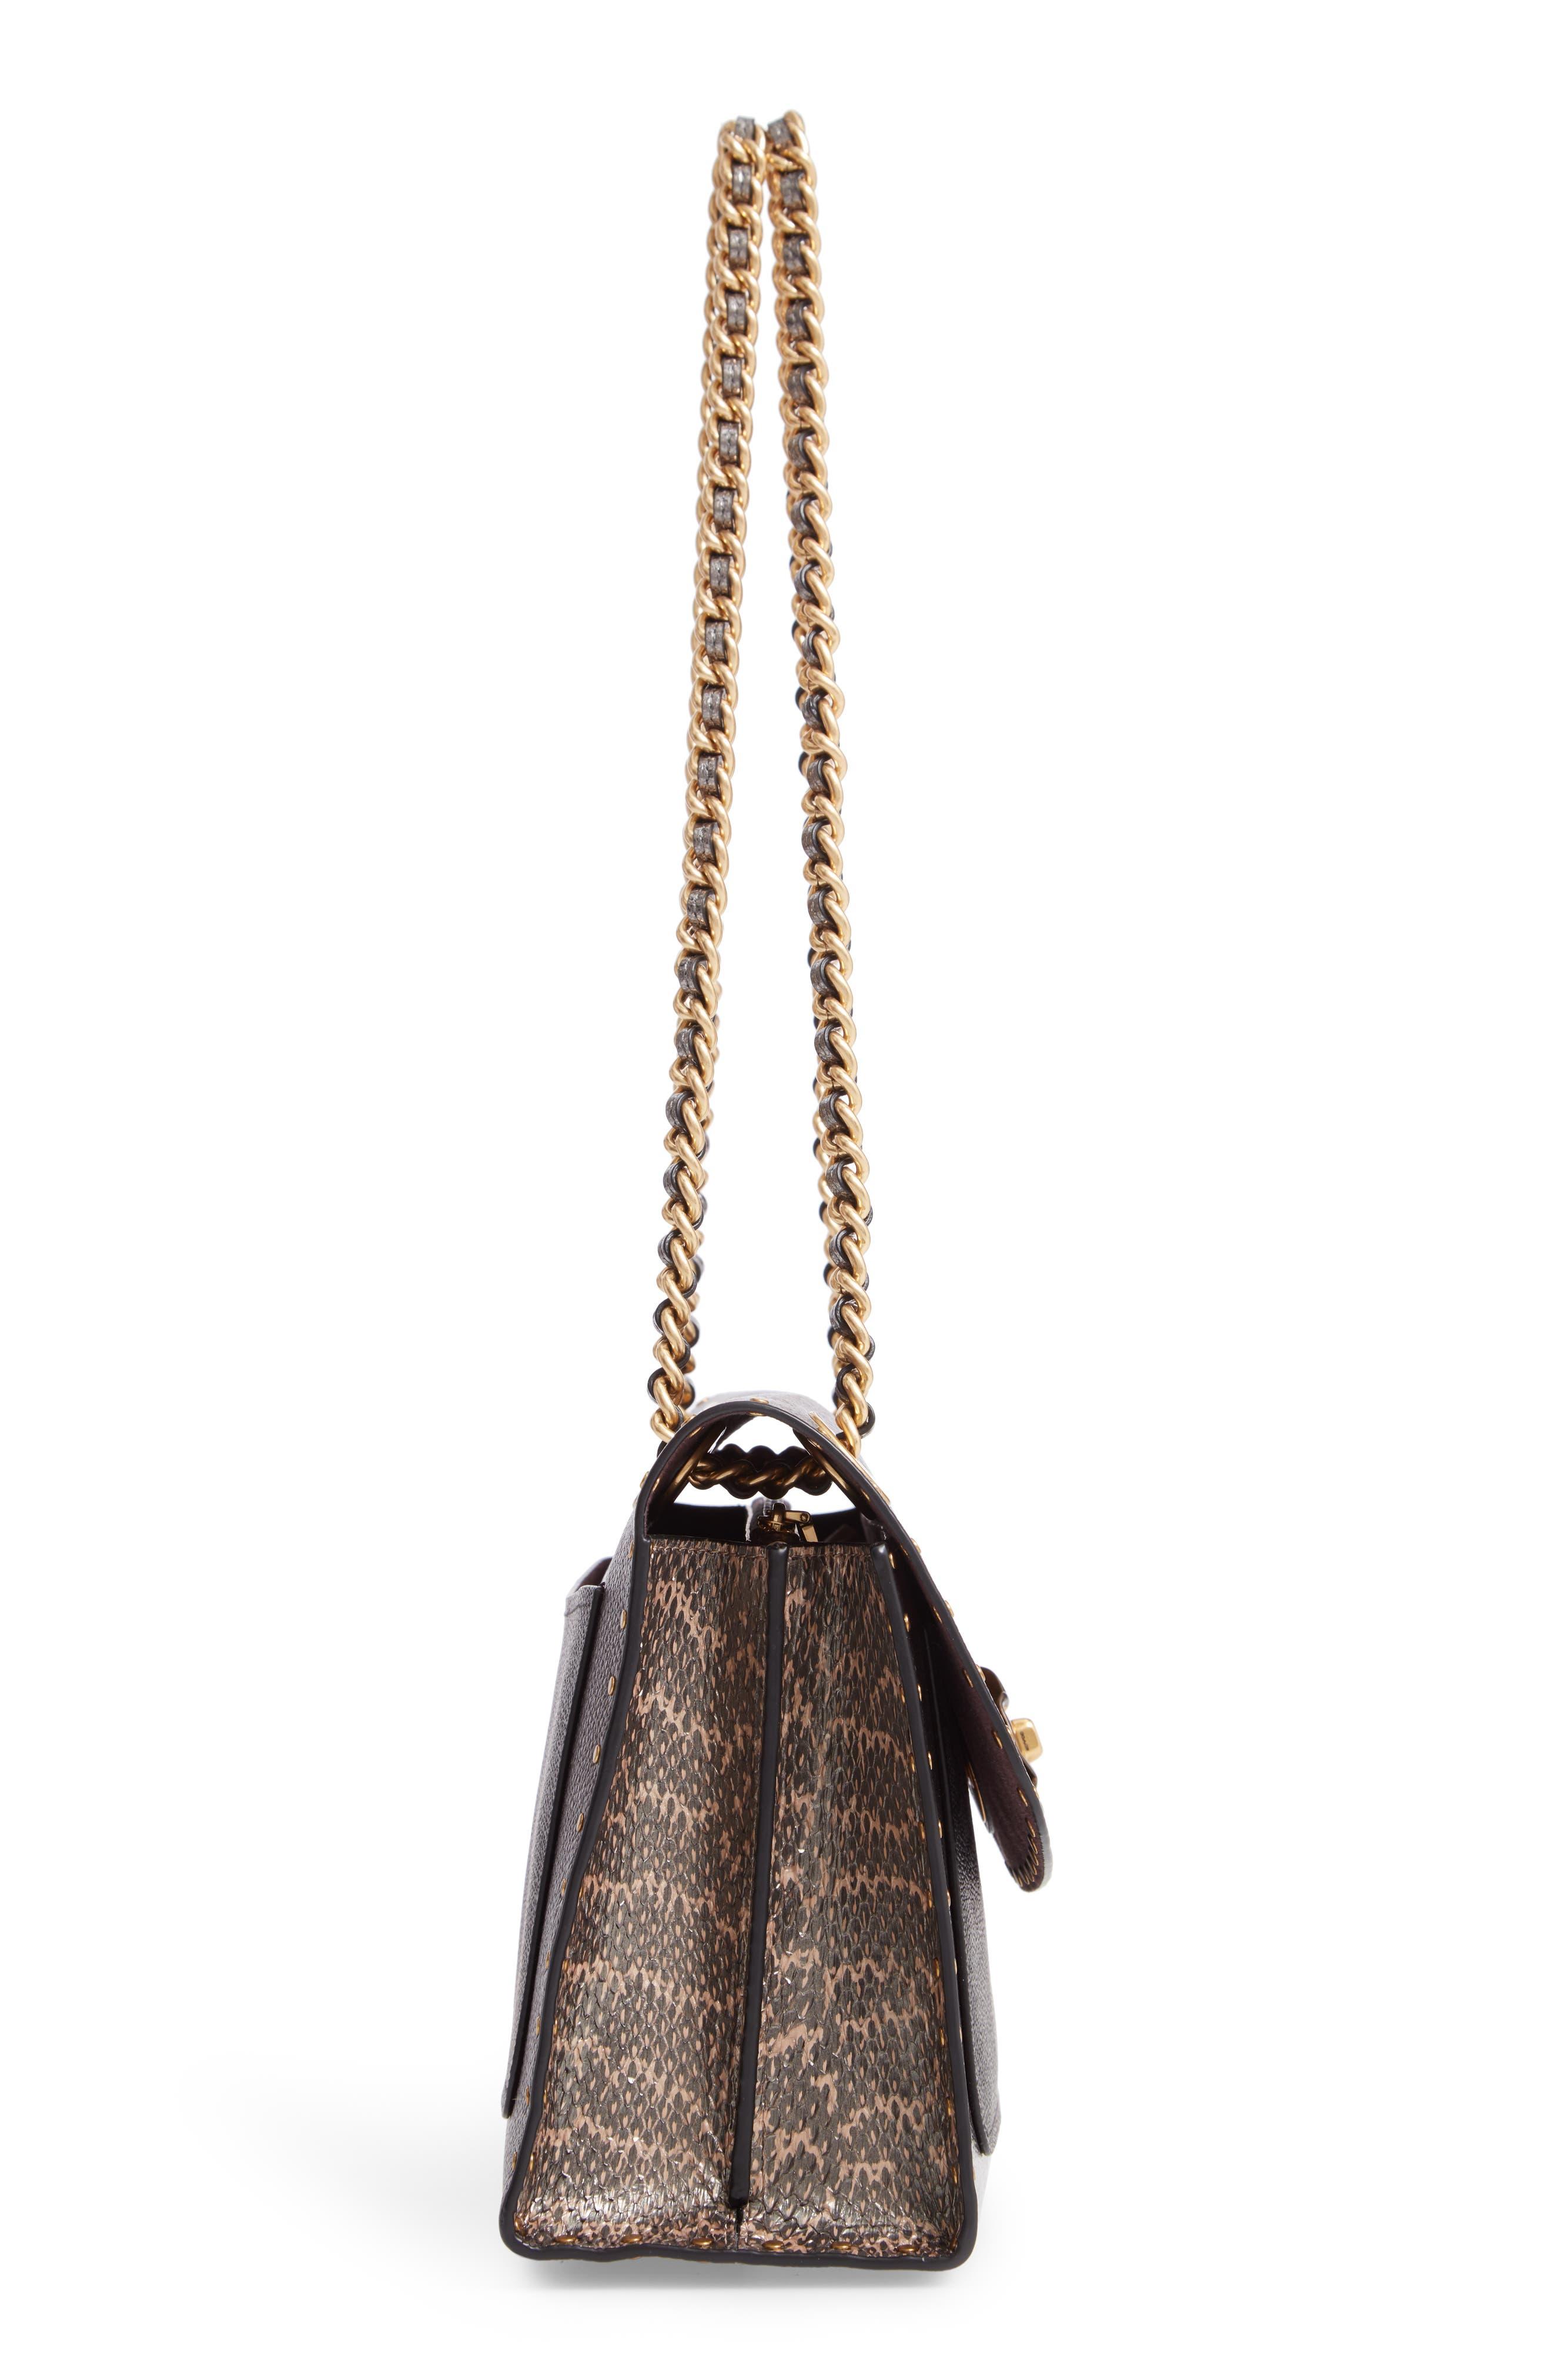 Signature Border Parker Leather & Genuine Snakeskin Shoulder Bag,                             Alternate thumbnail 5, color,                             CHARCOAL METALLIC GRAPHITE